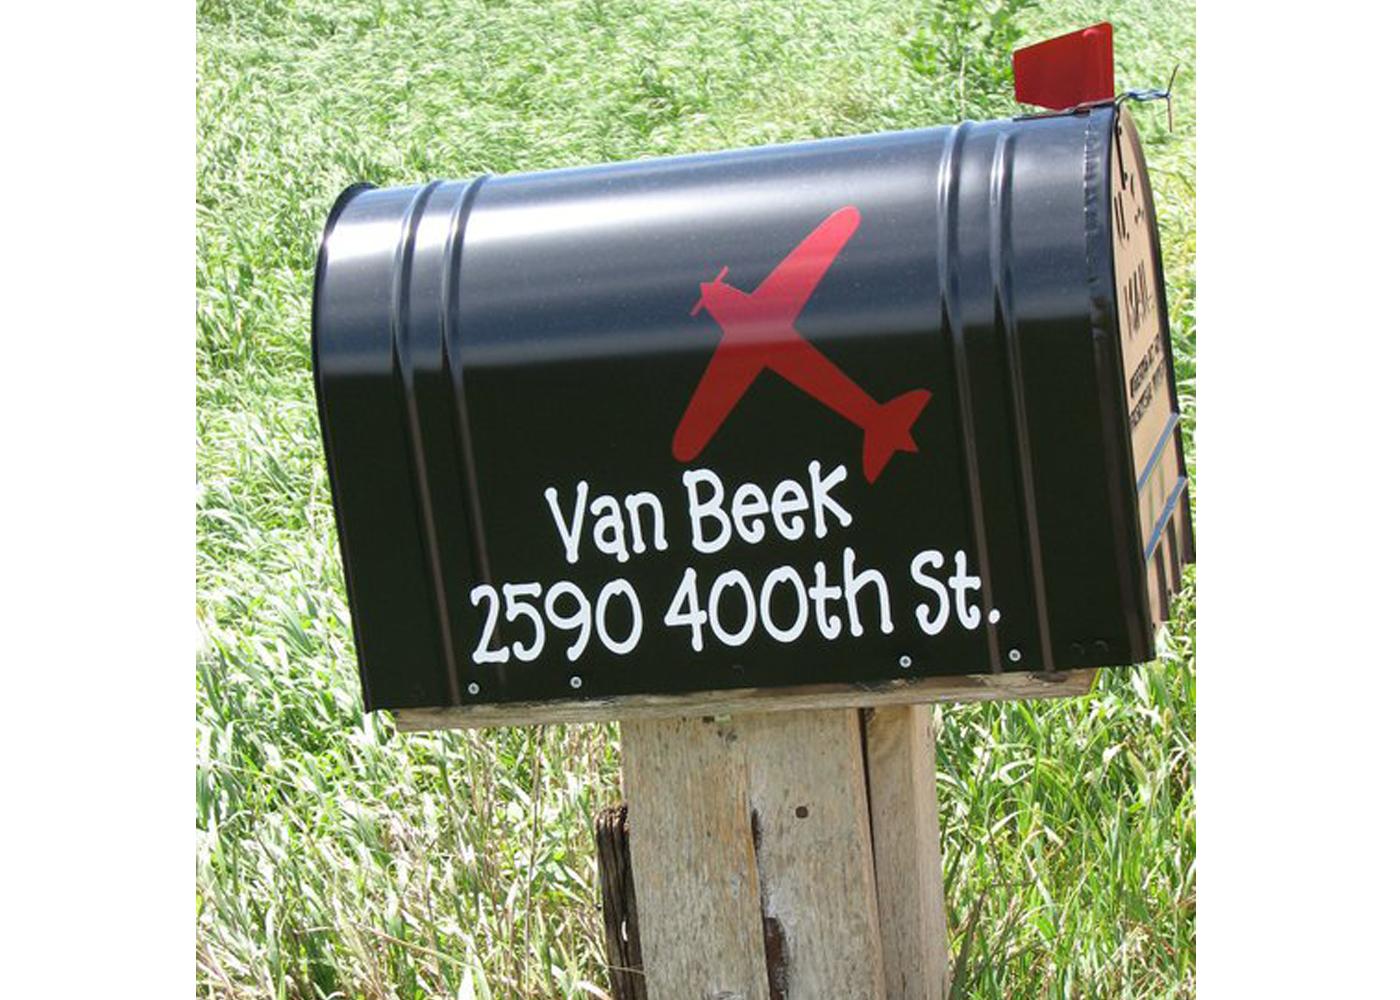 mailbox-jumbo-customized-with-airplane-viny-decals.jpg